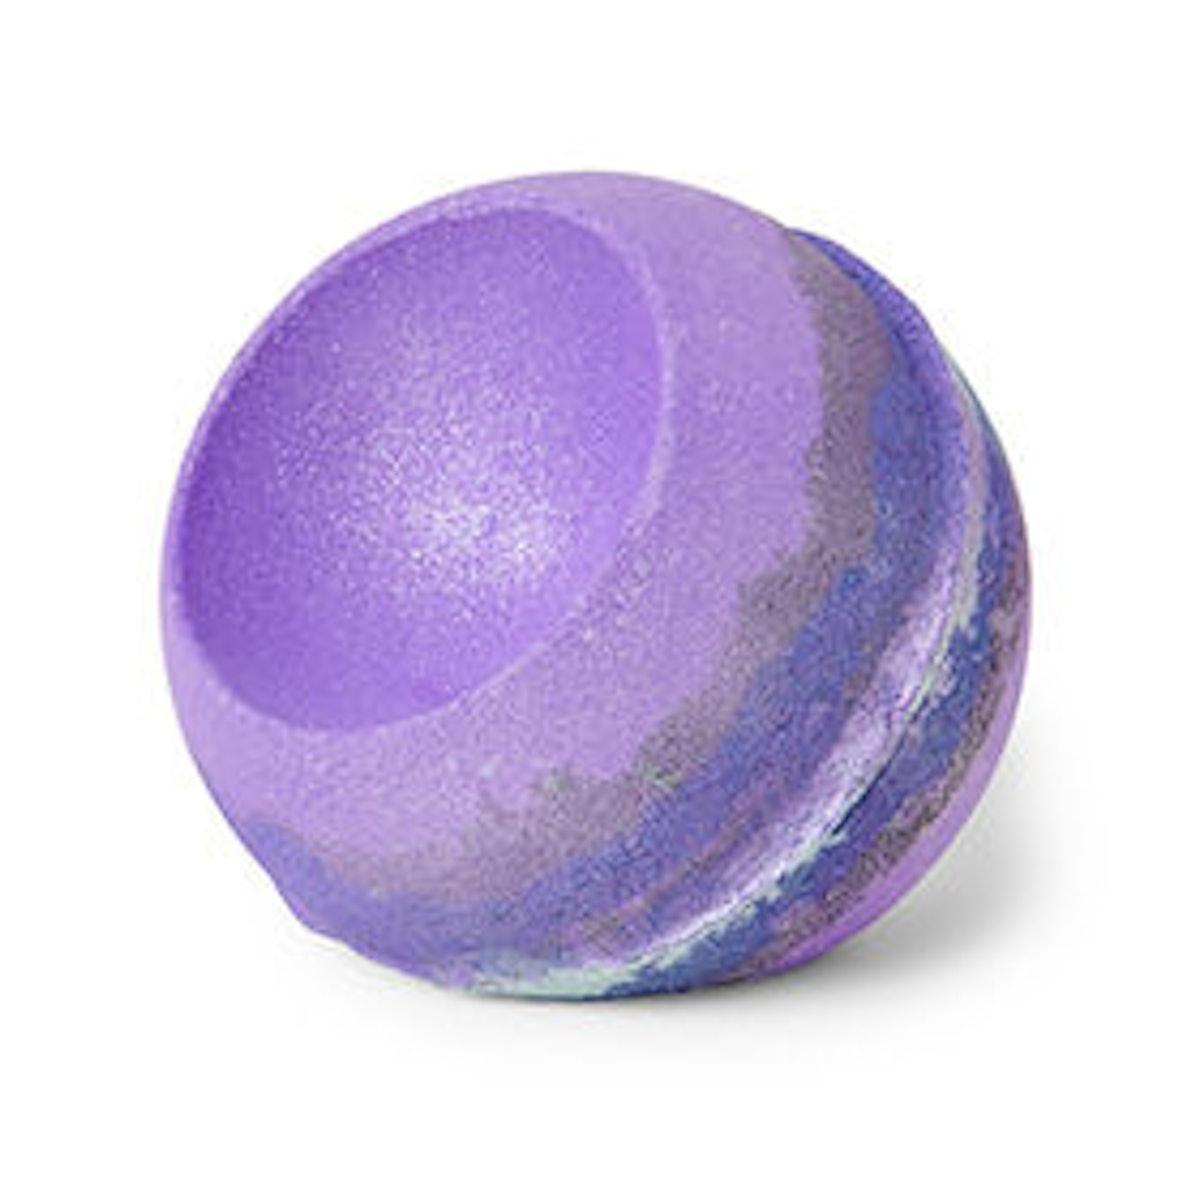 Goddess Bath Bomb